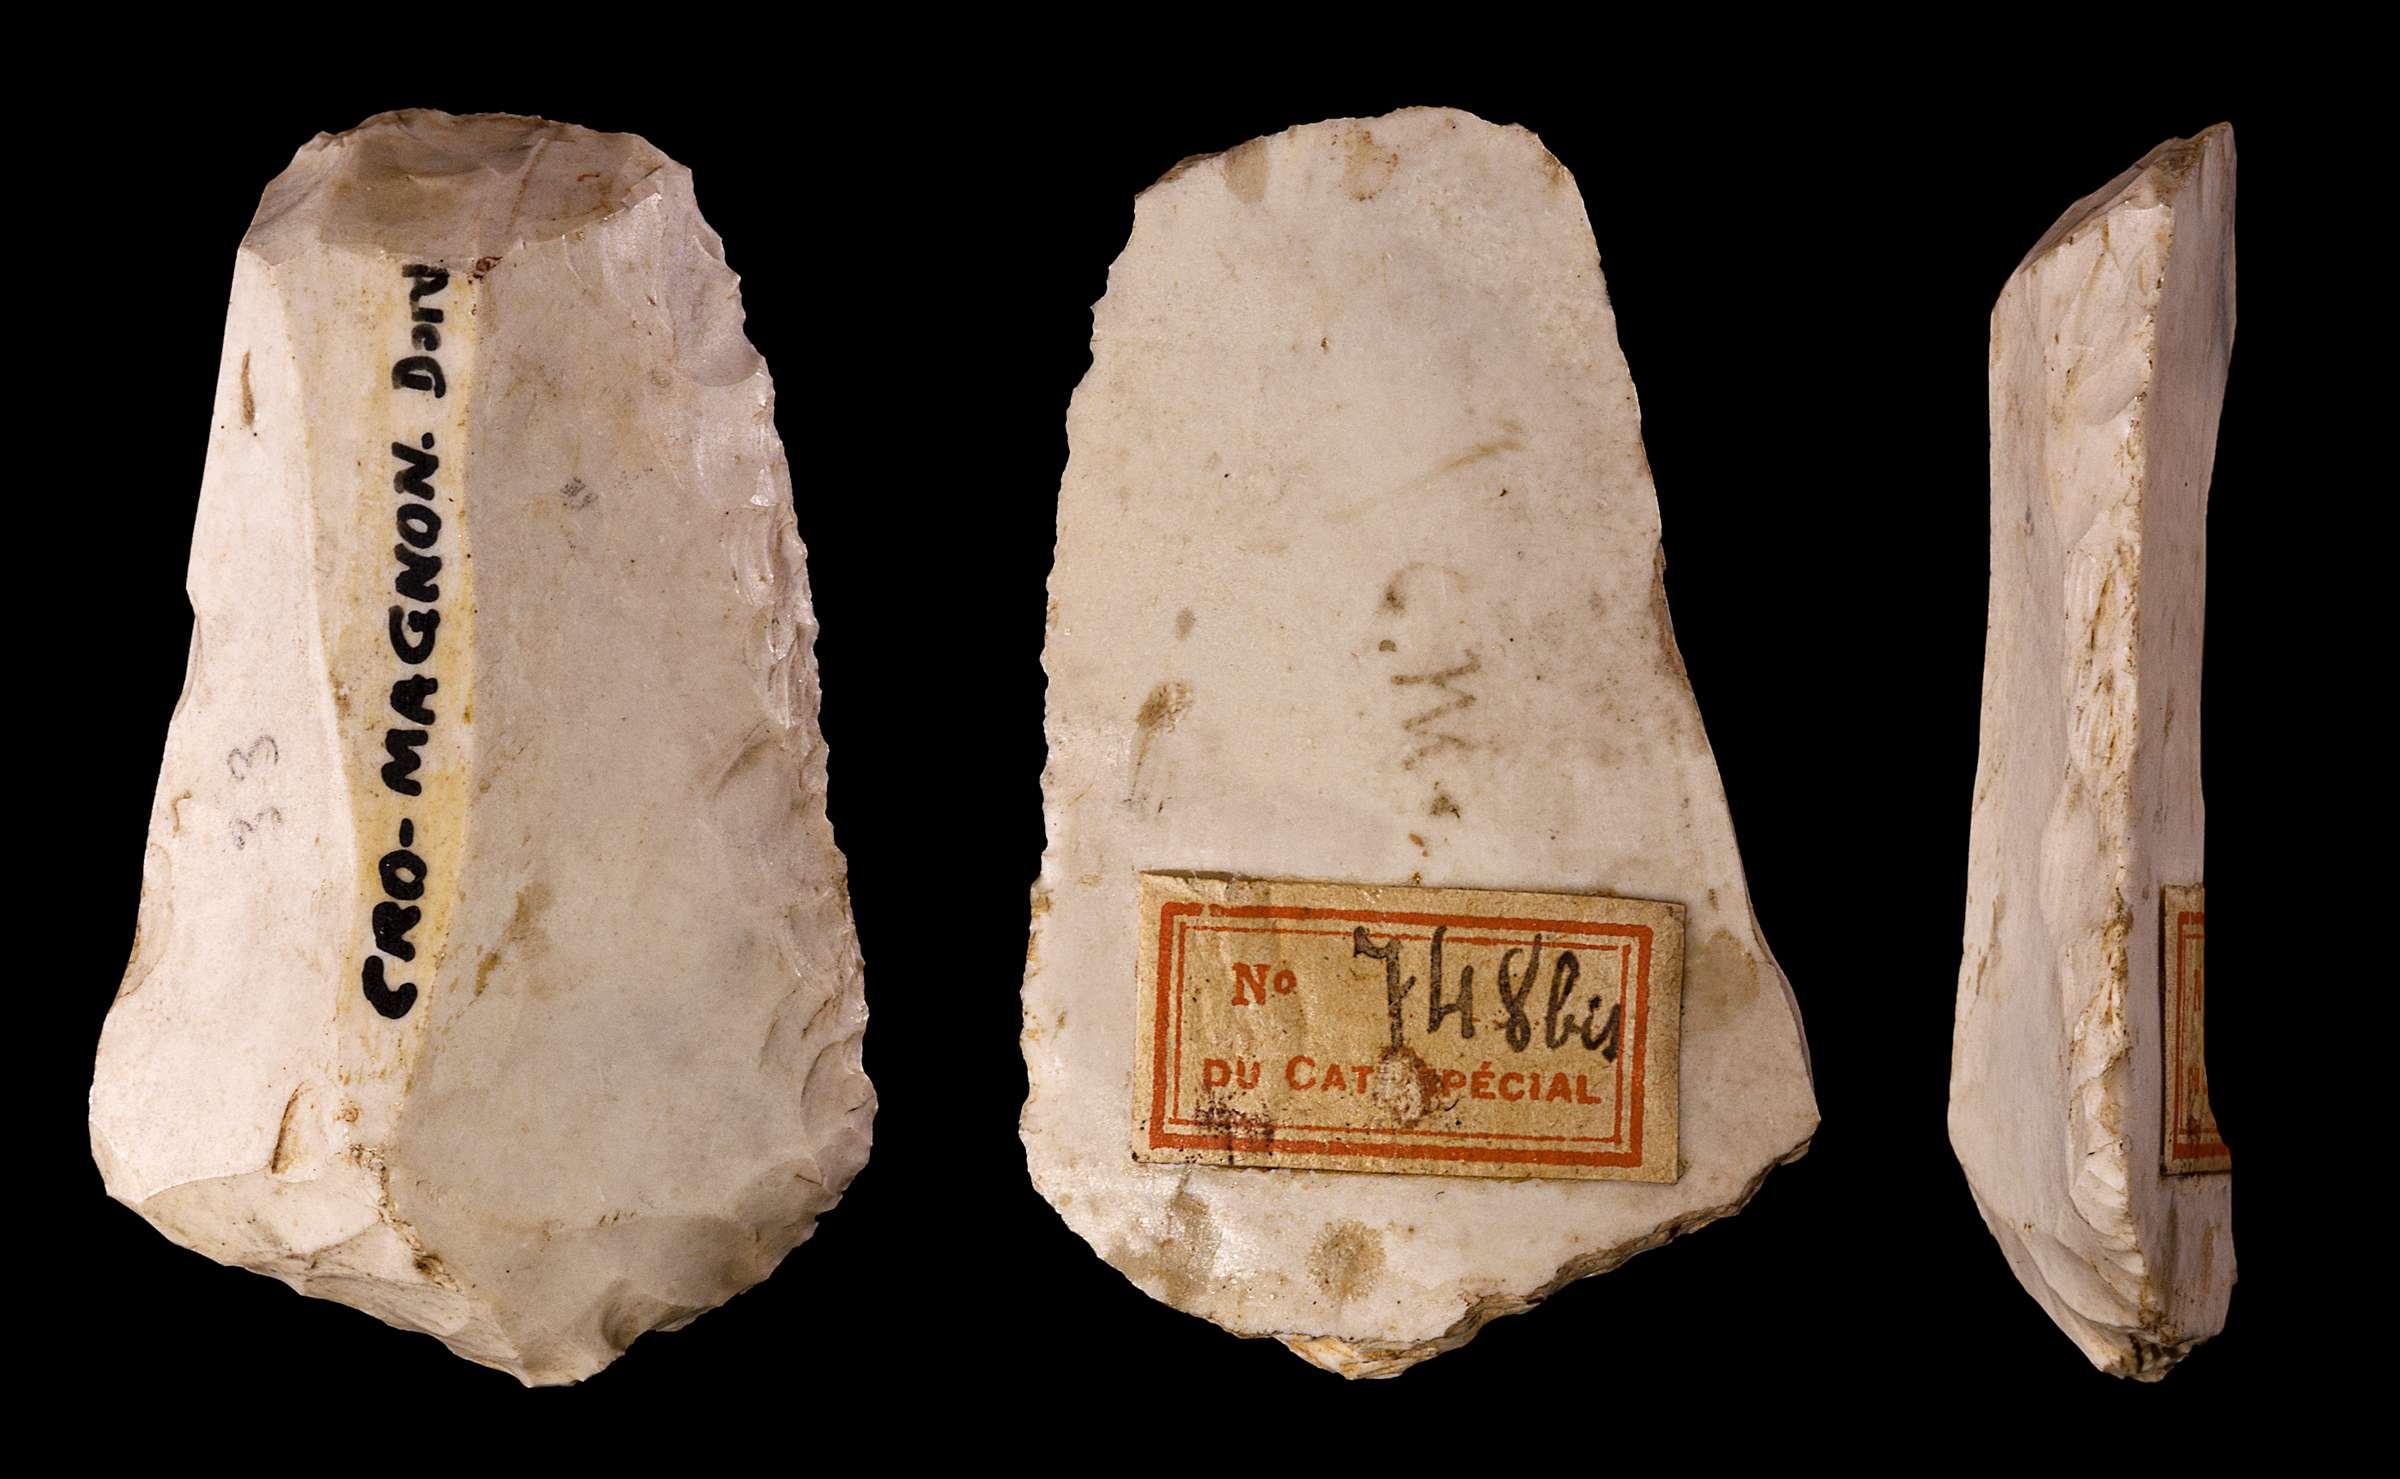 Cro-Magnon tool